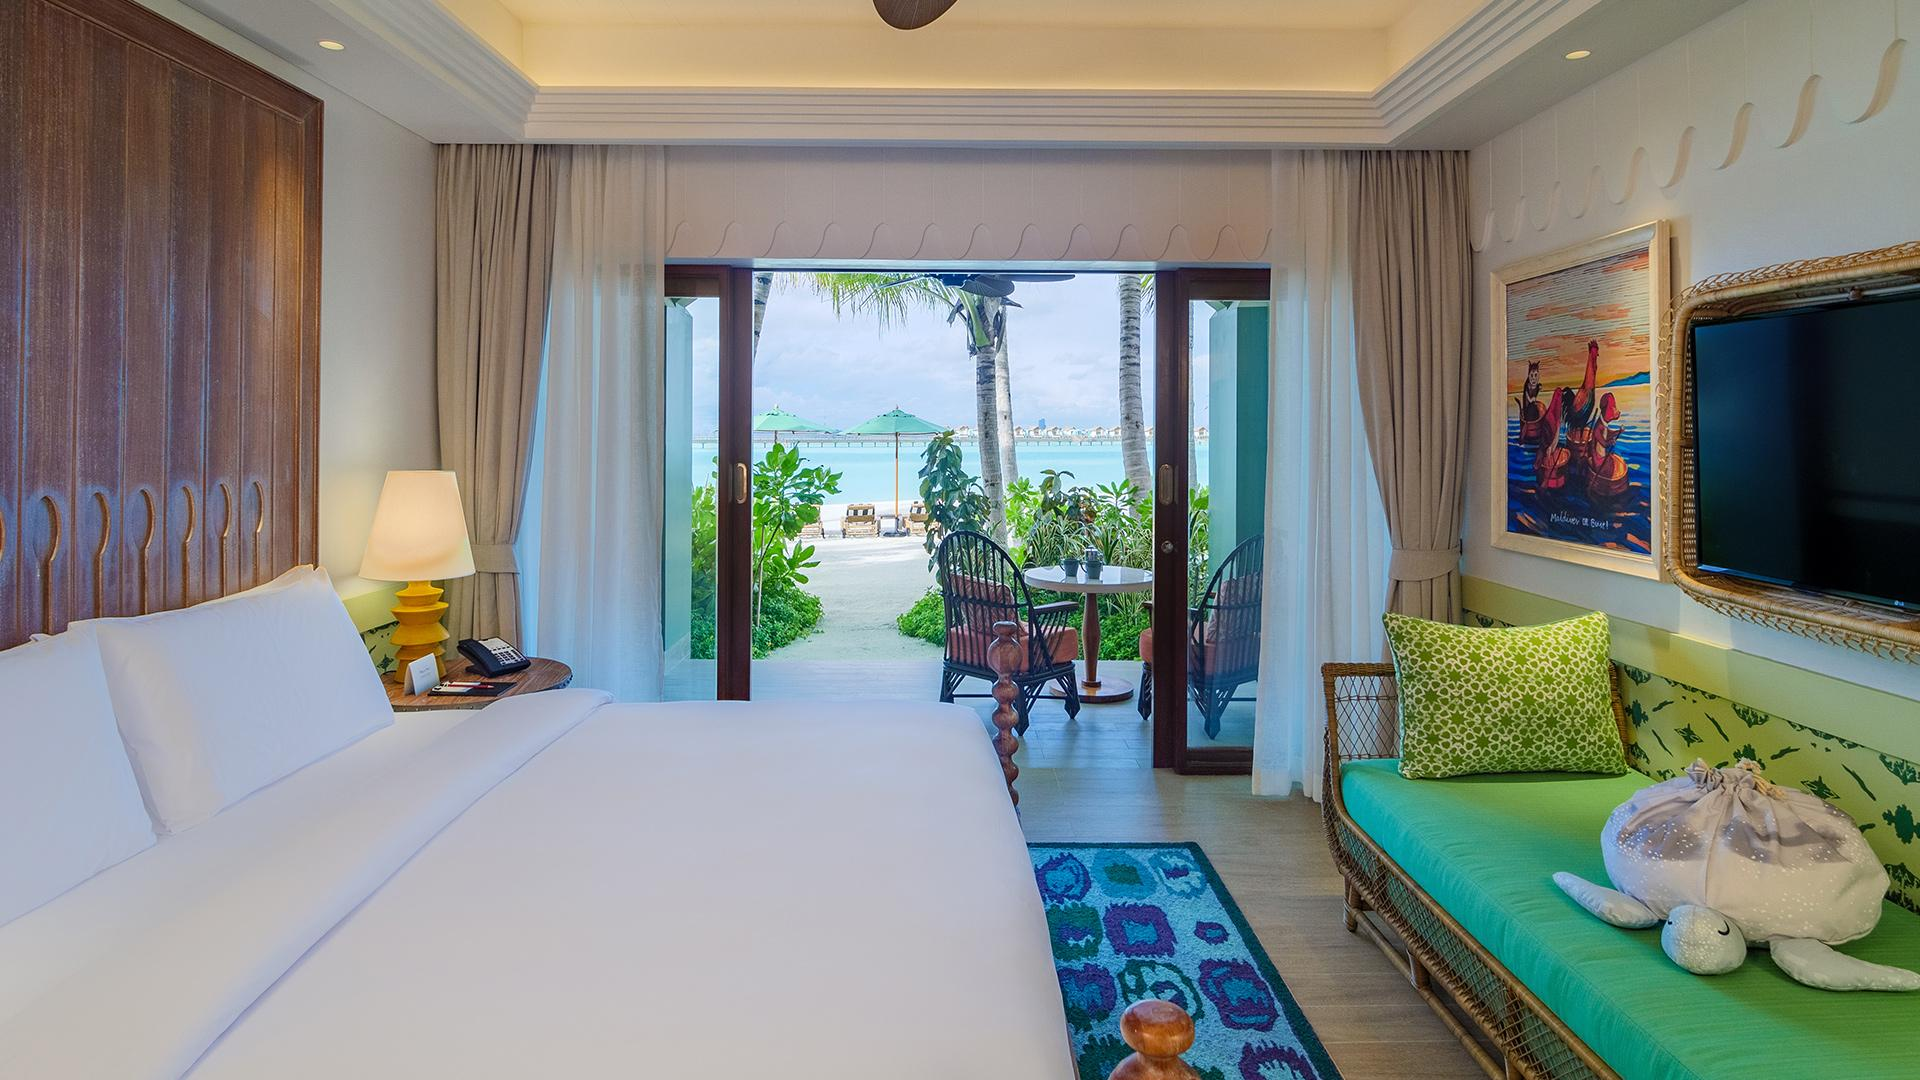 Beach Room  image 1 at SAii Lagoon Maldives, Curio Collection by Hilton by Kaafu Atoll, North Central Province, Maldives